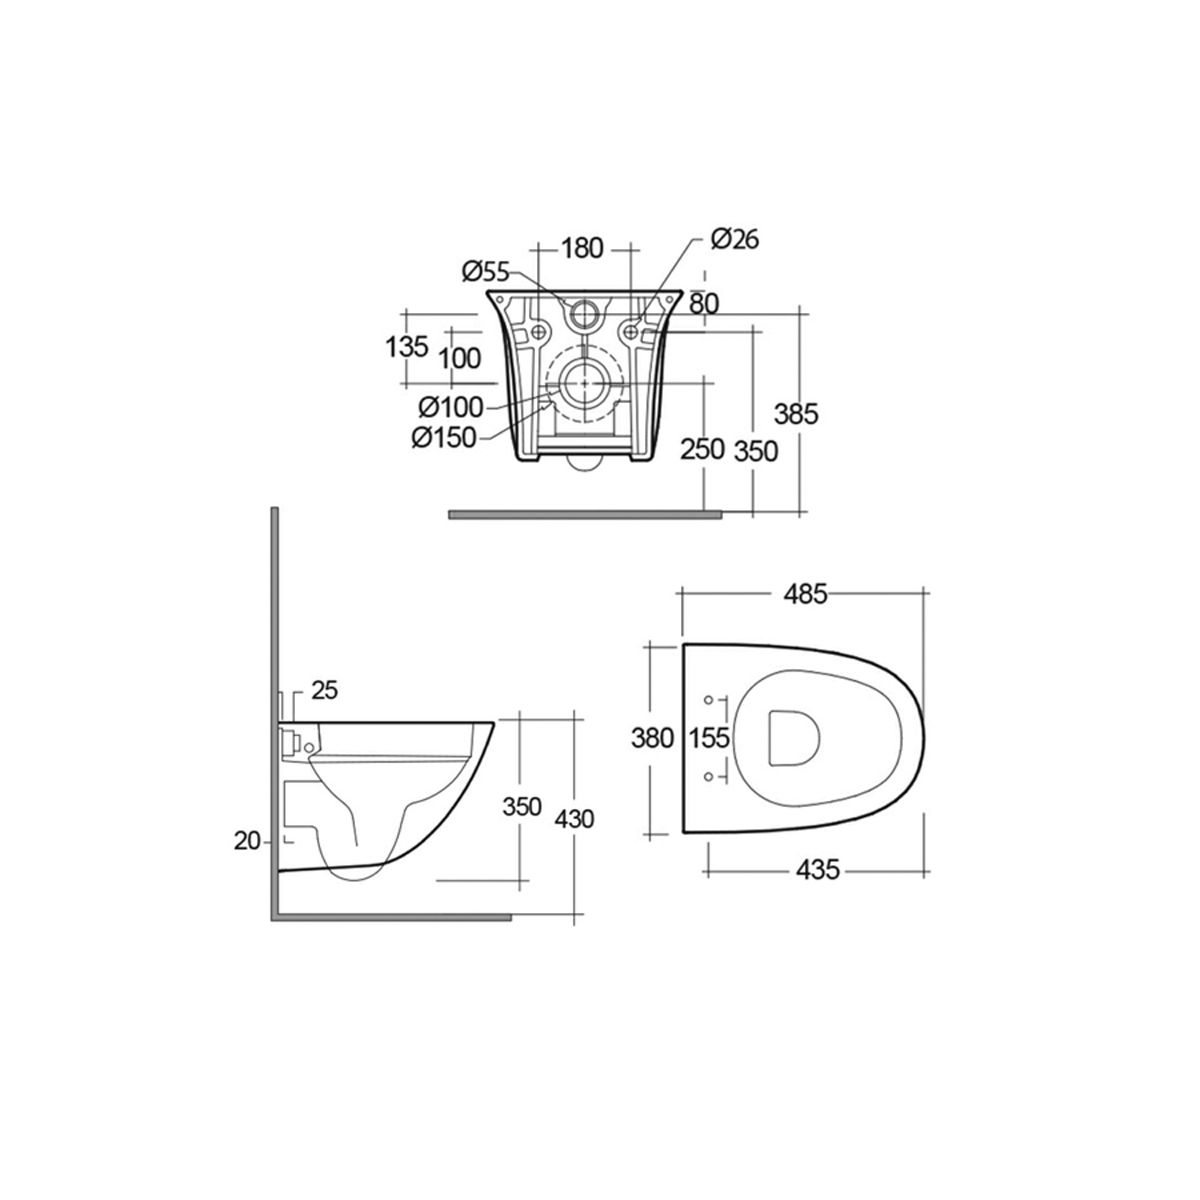 RAK Sensation Mini Wall Hung Toilet with Soft Close Seat